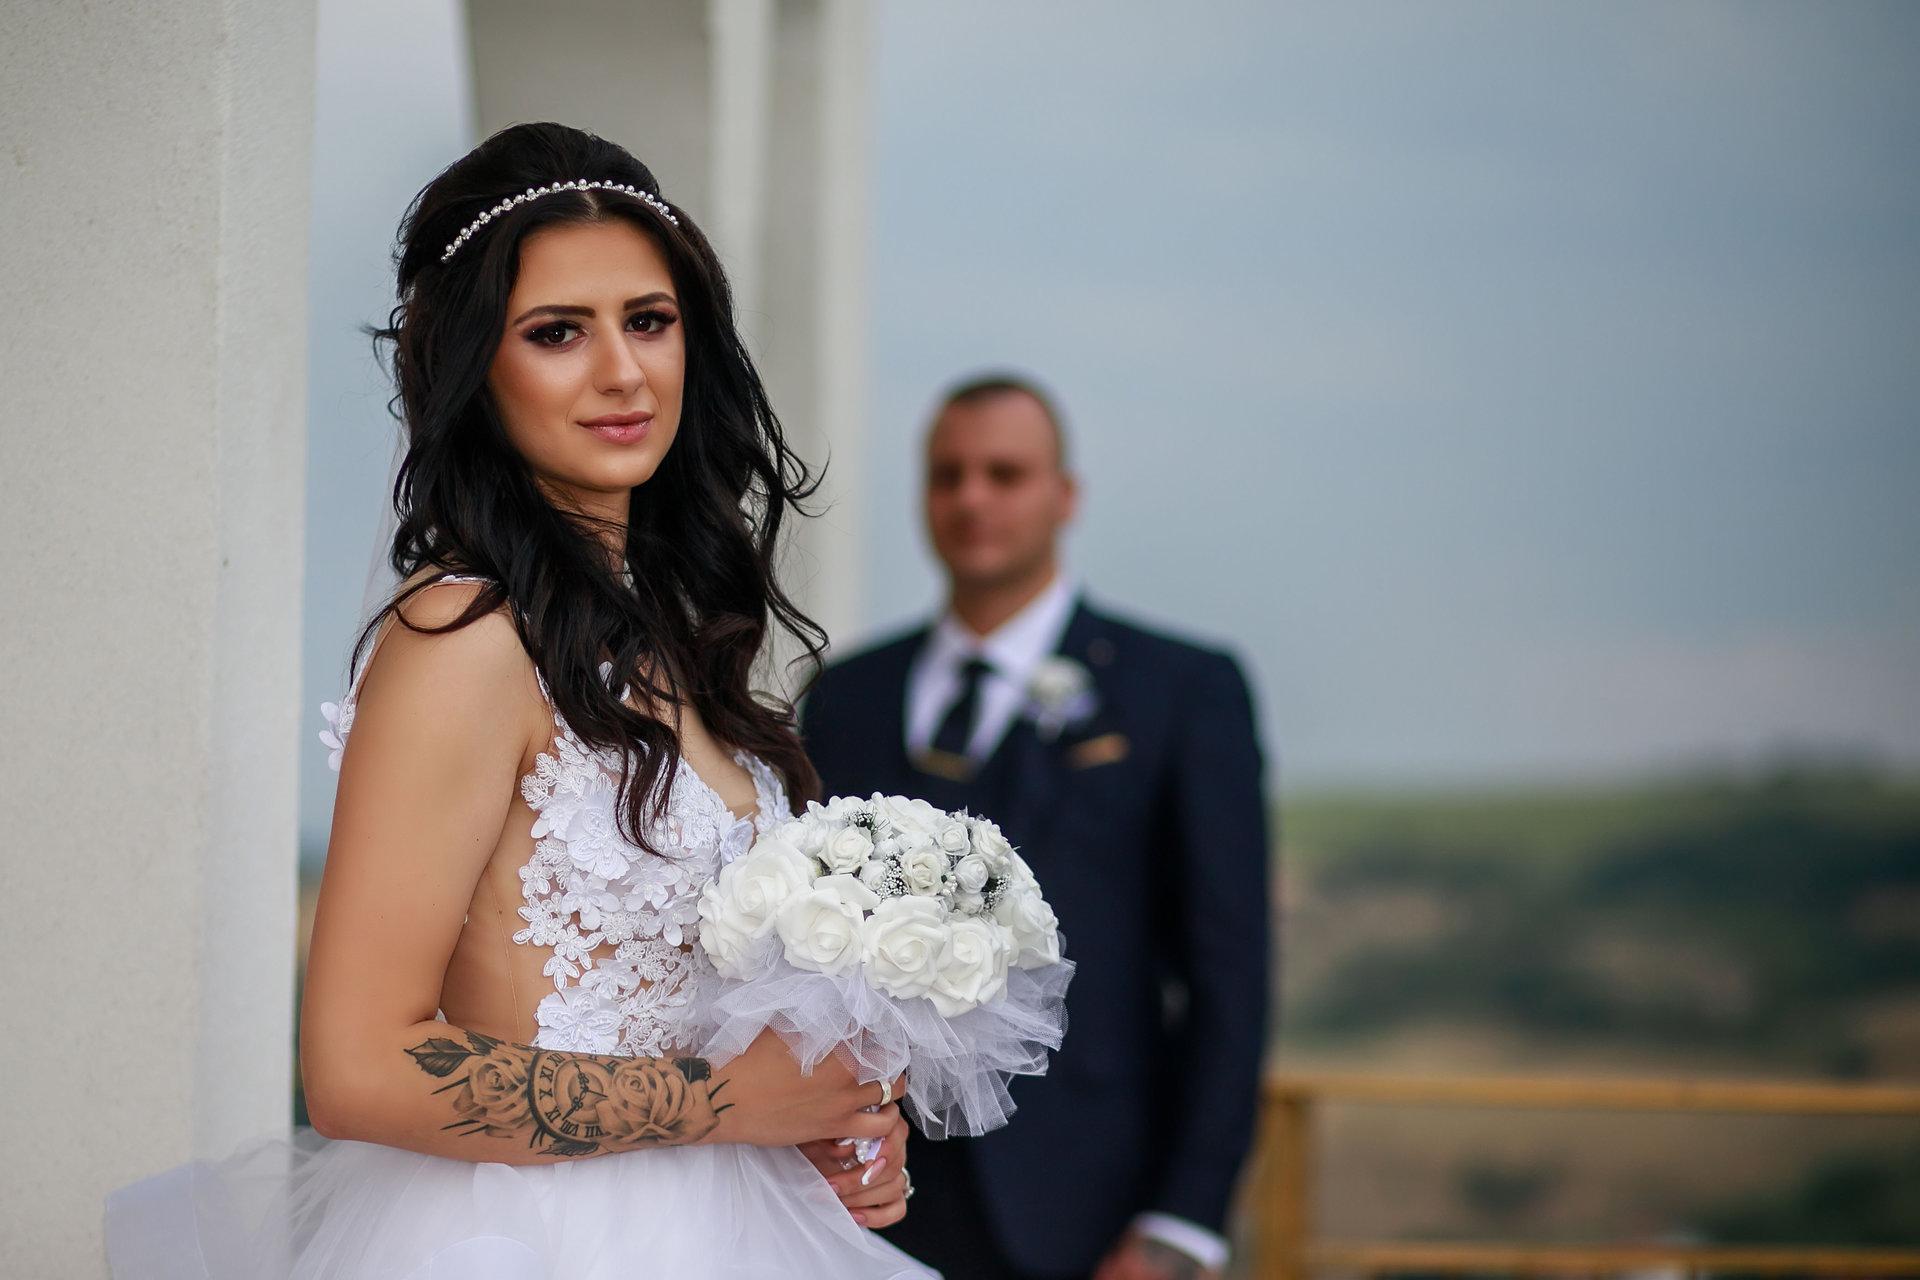 Photo in Wedding | Author Pavel Nikolov - docentp | PHOTO FORUM